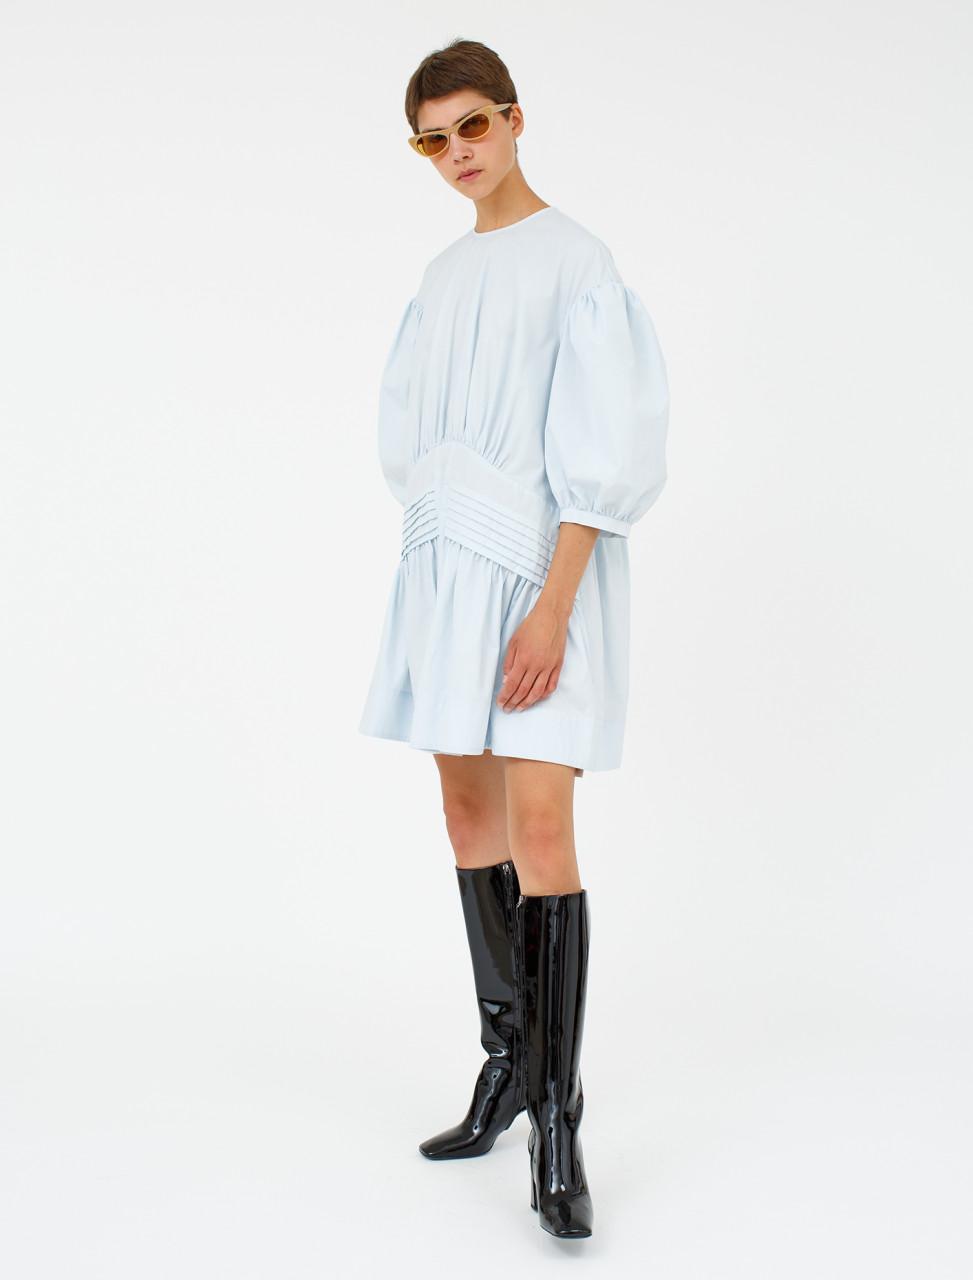 Pin Tuck Smock Dress